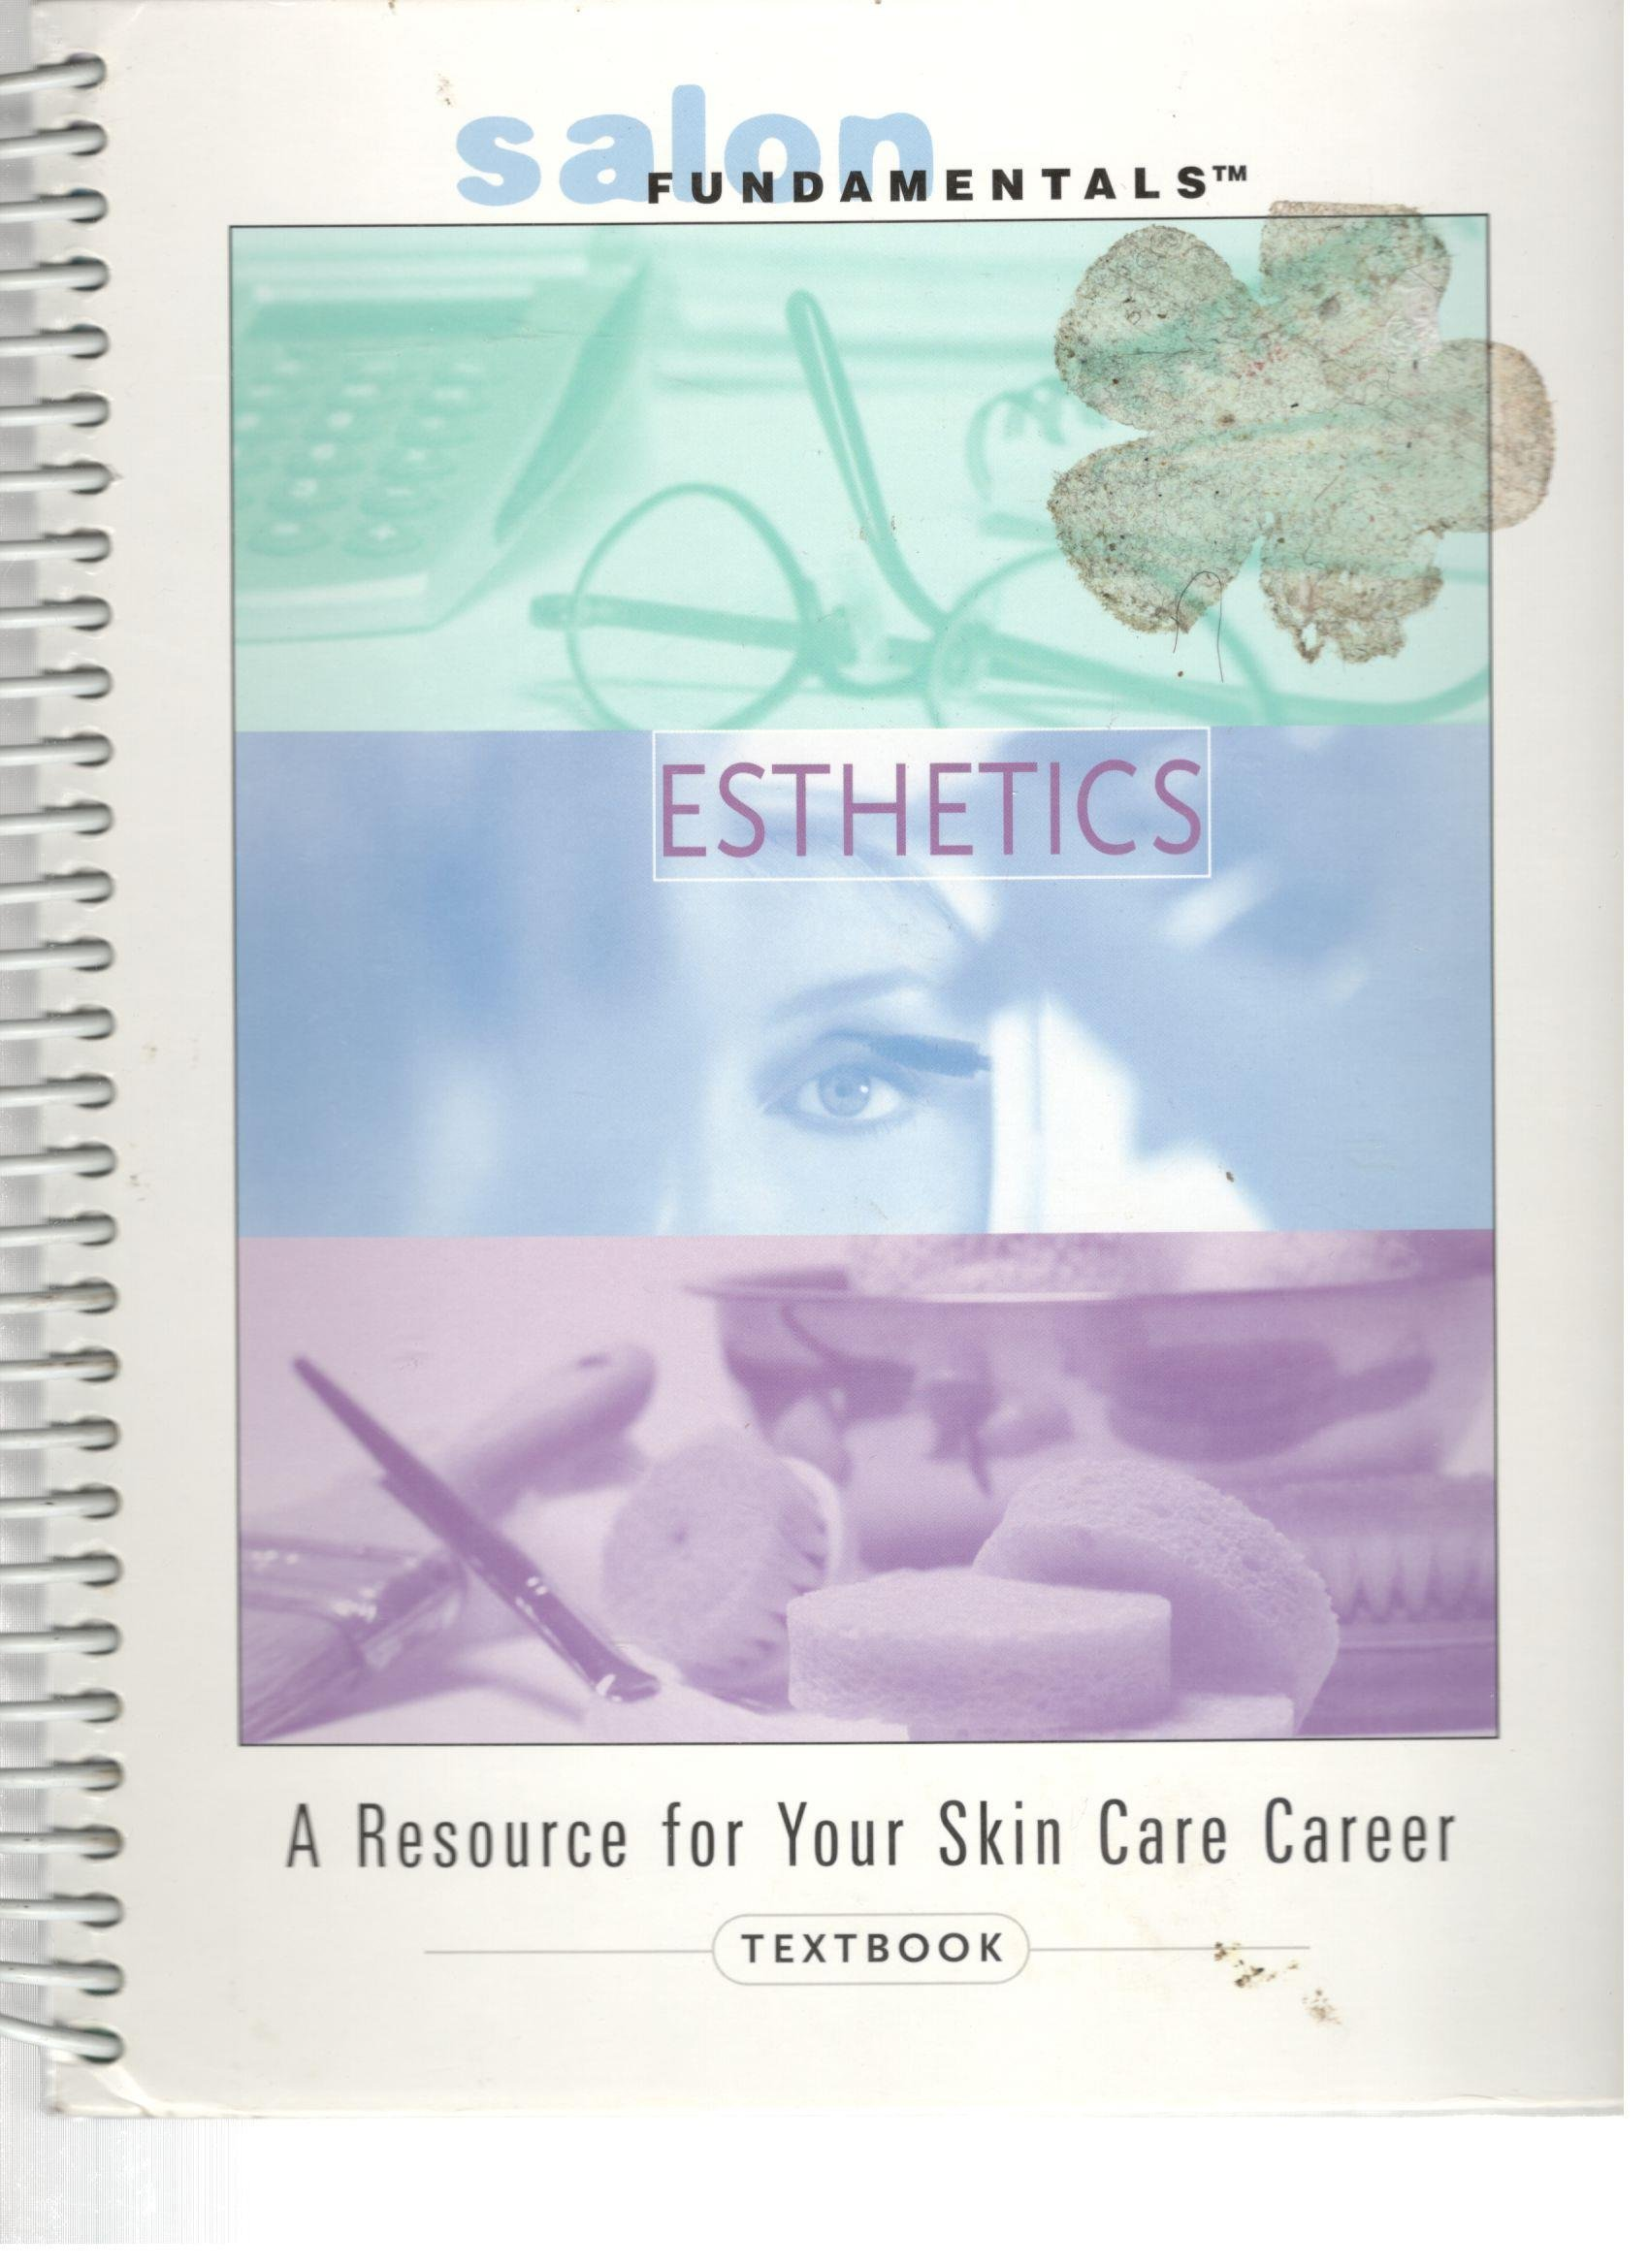 Salon fundamentals esthetics a resource for your skin care career (2004  textbook): Pivot: Amazon.com: Books